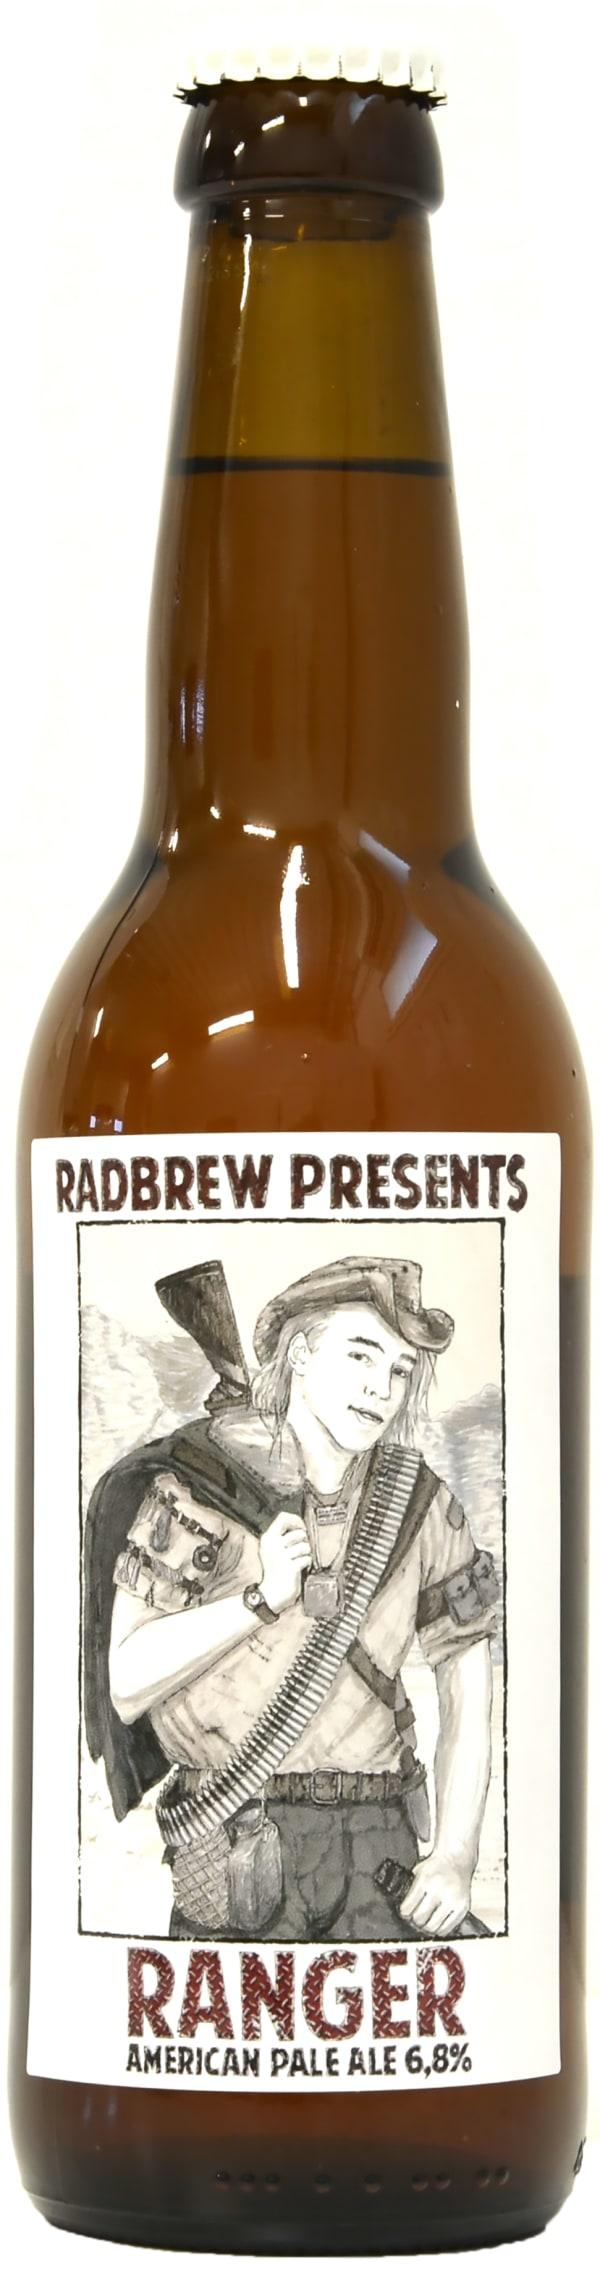 Radbrew Ranger American Pale Ale